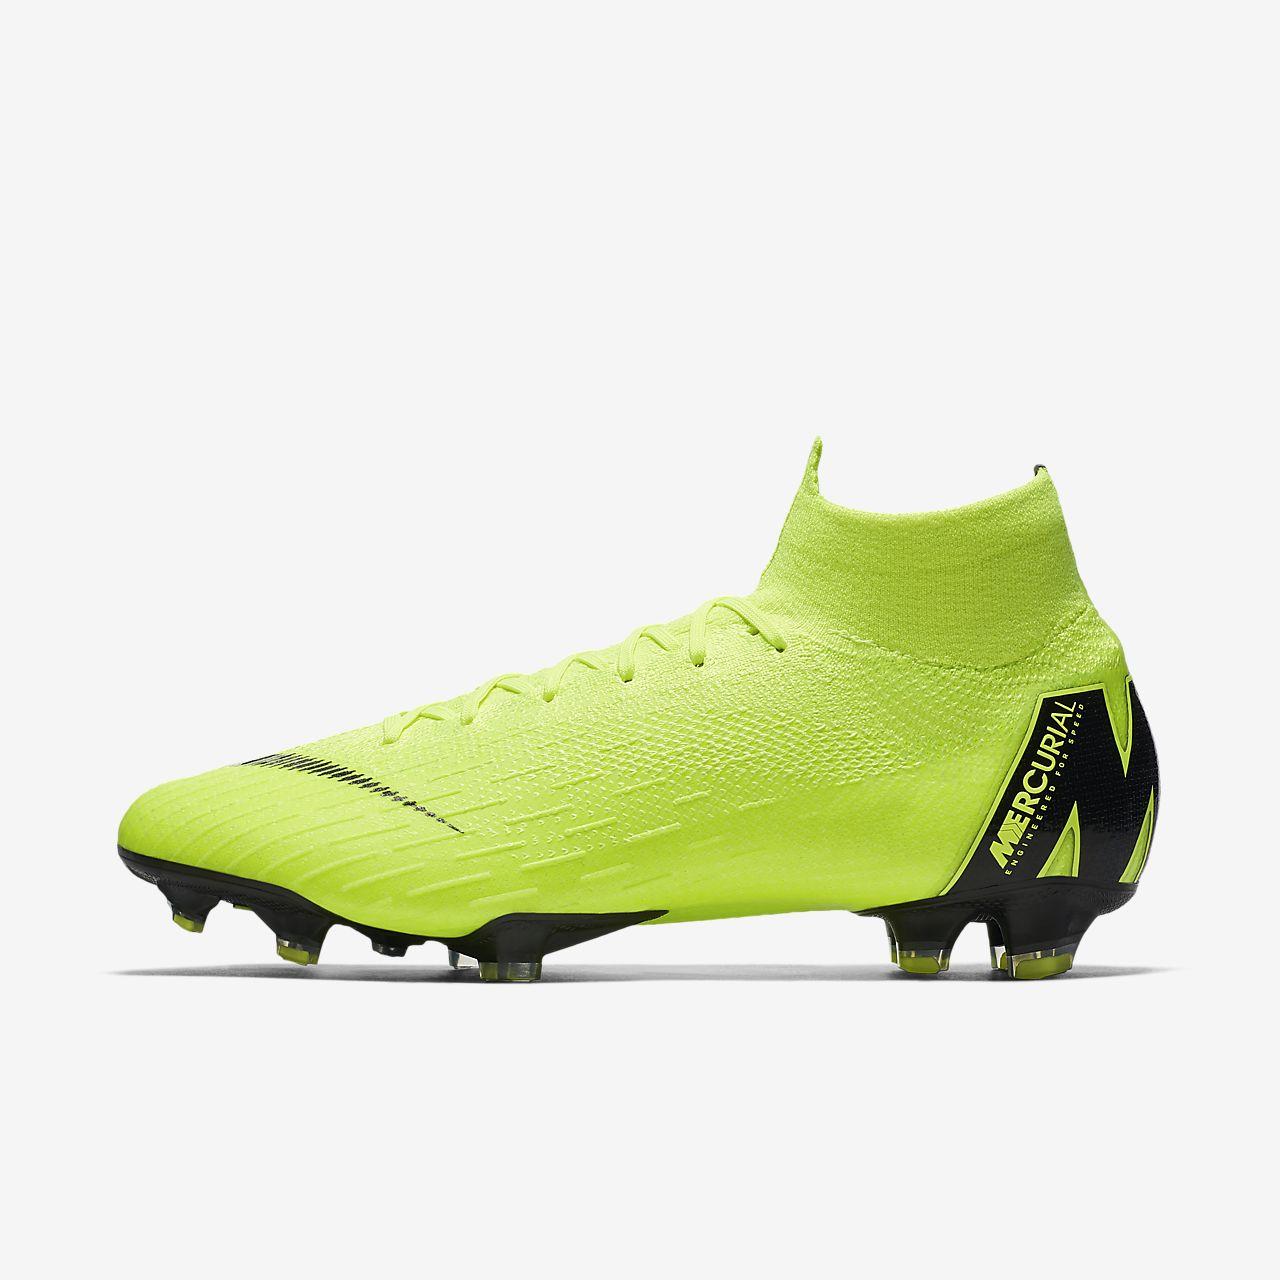 Nike Superfly 6 Elite FG Firm-Ground